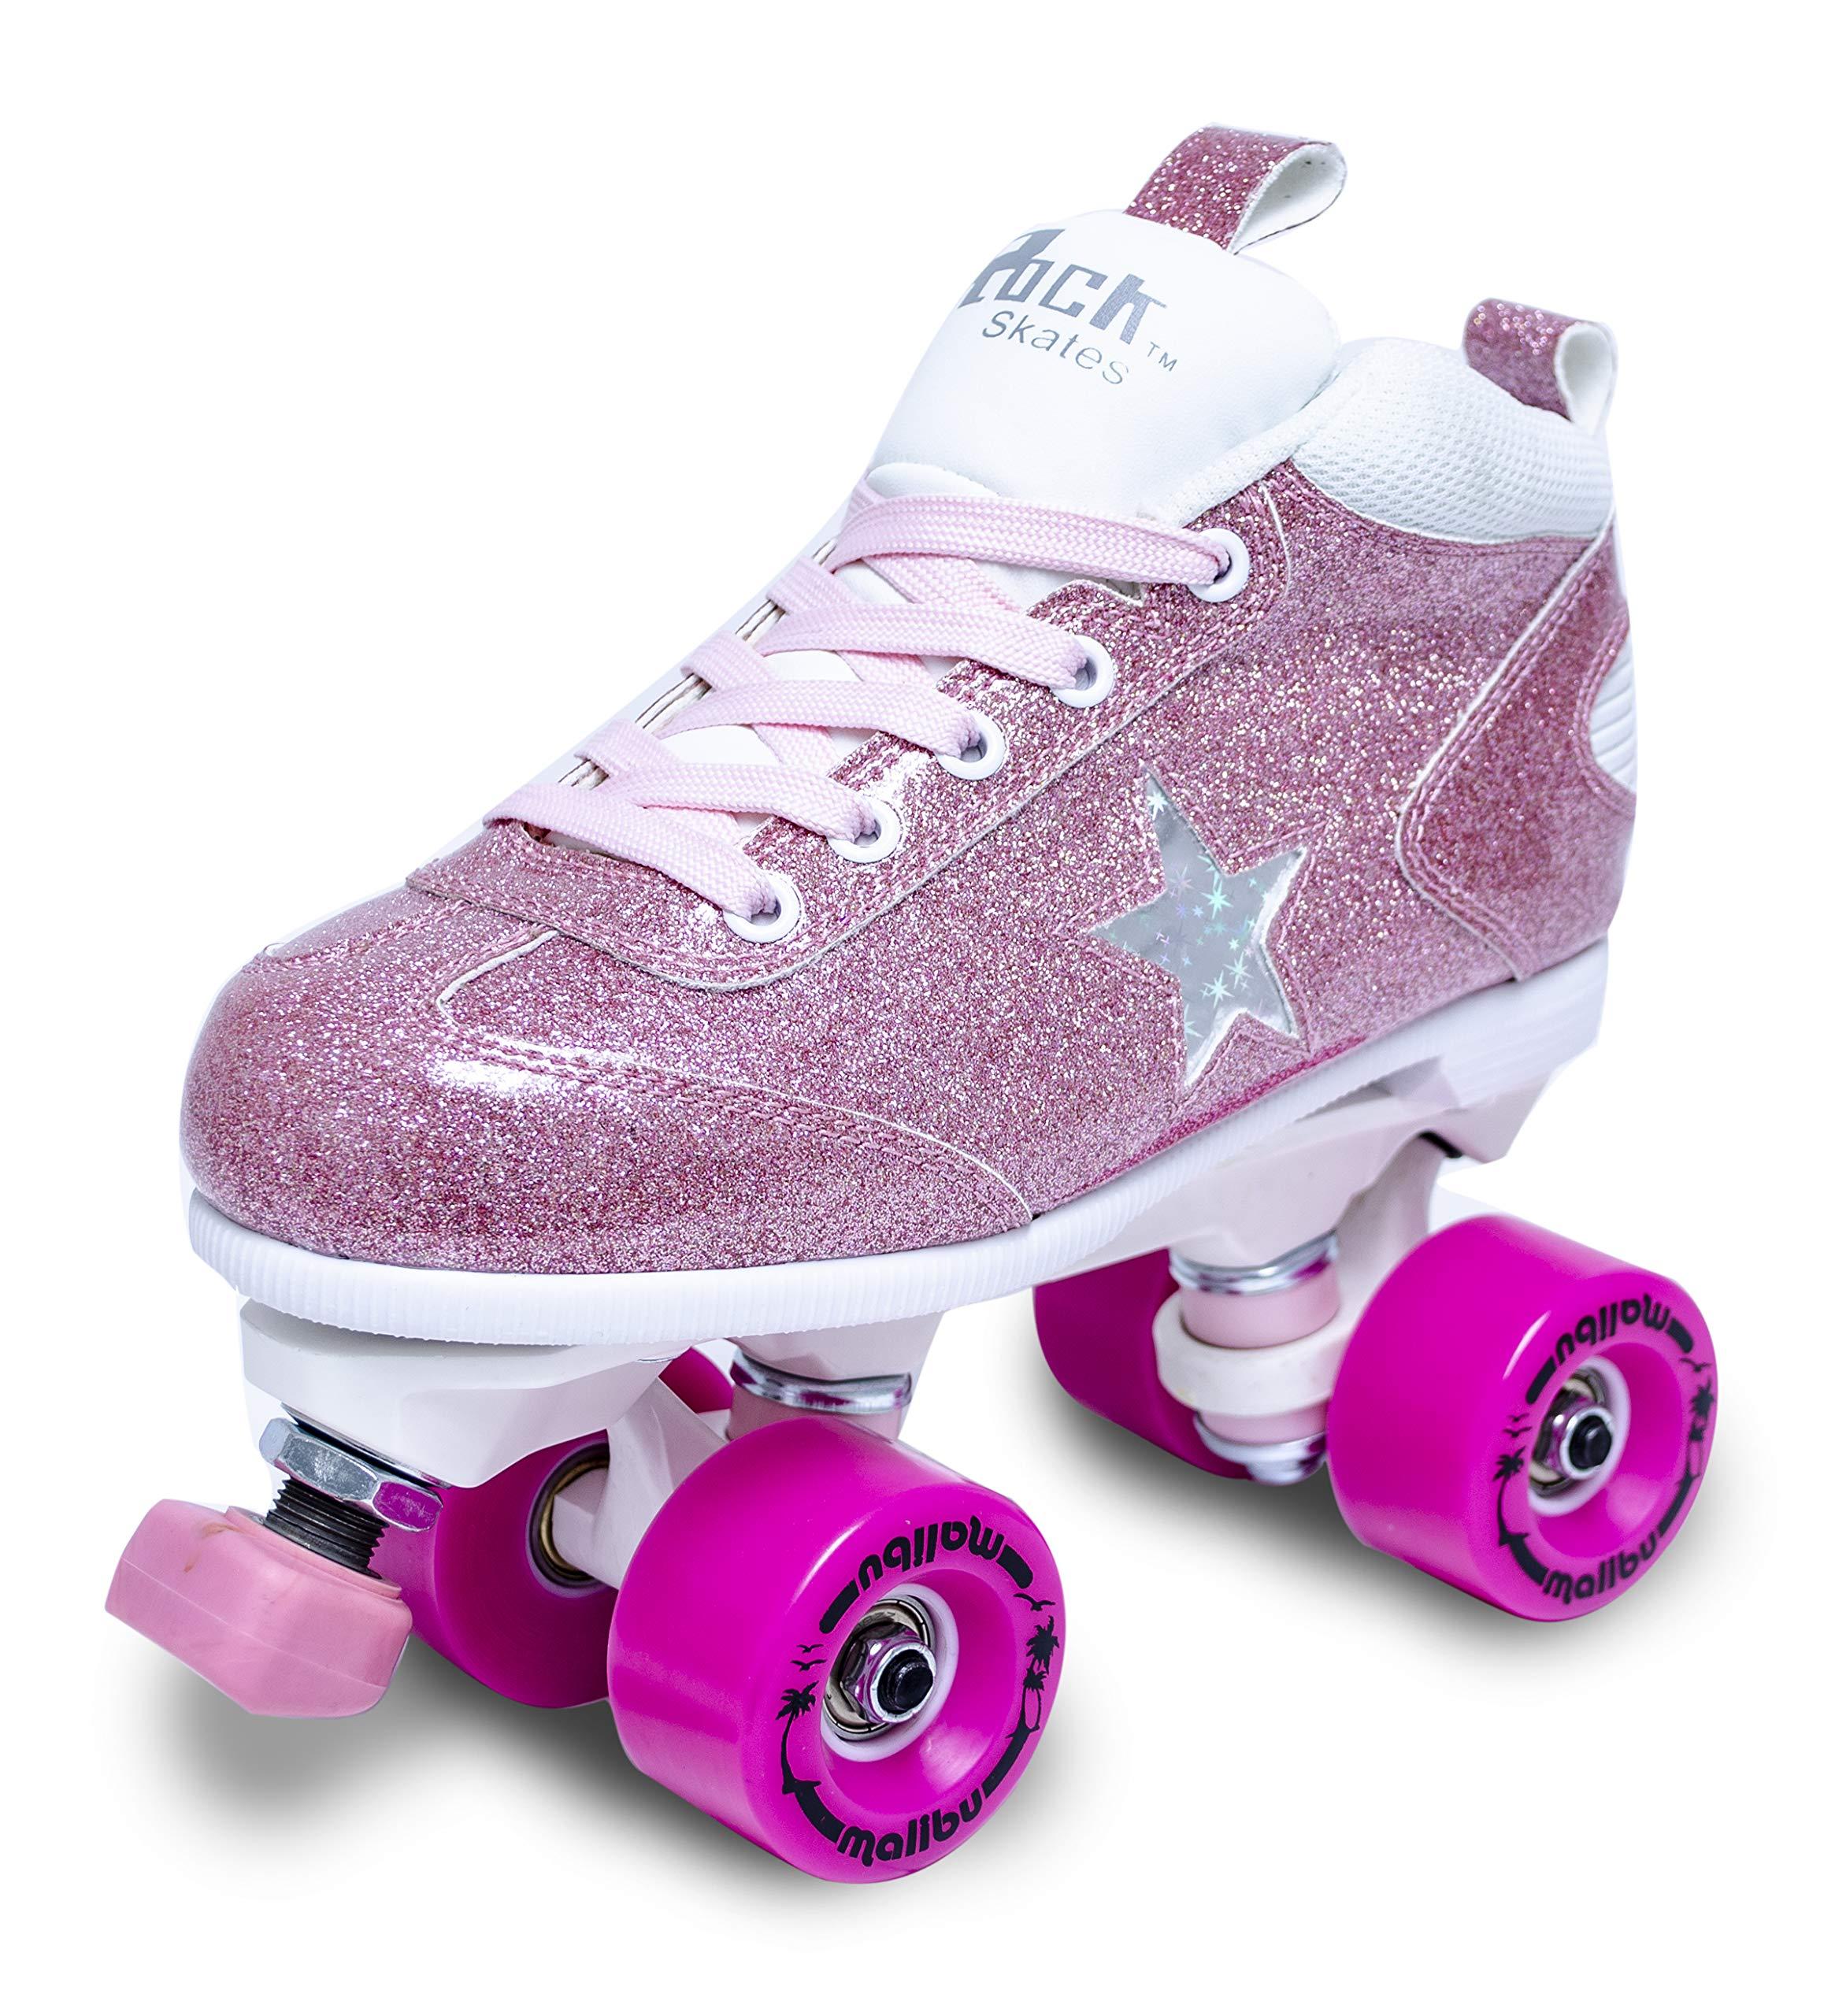 Sure-Grip Rock Star Pink Glitter Roller Skates (5)